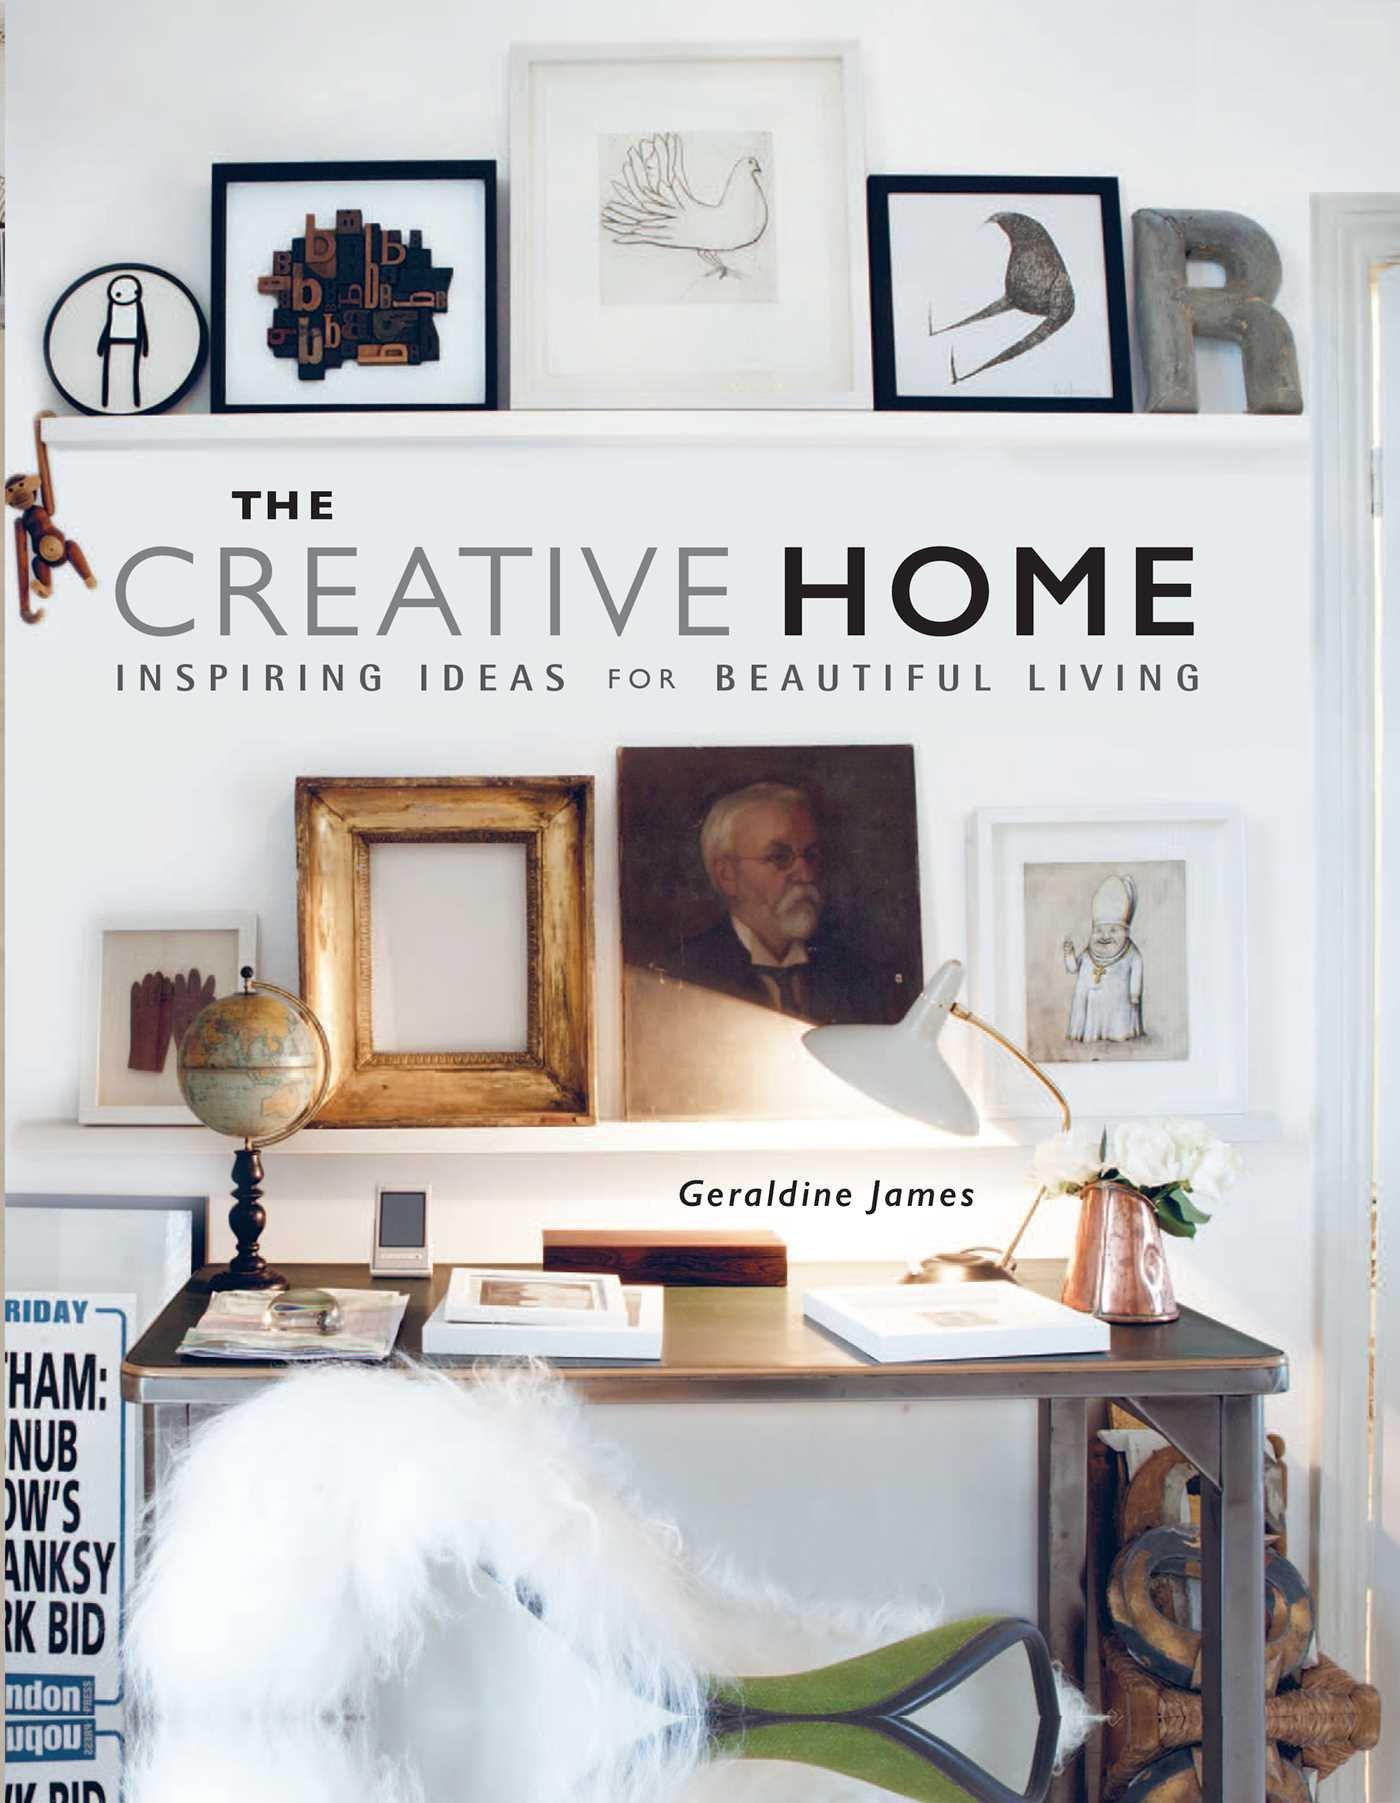 the creative home inspiring ideas for beautiful living geraldine the creative home inspiring ideas for beautiful living geraldine james 9781782493587 amazon com books